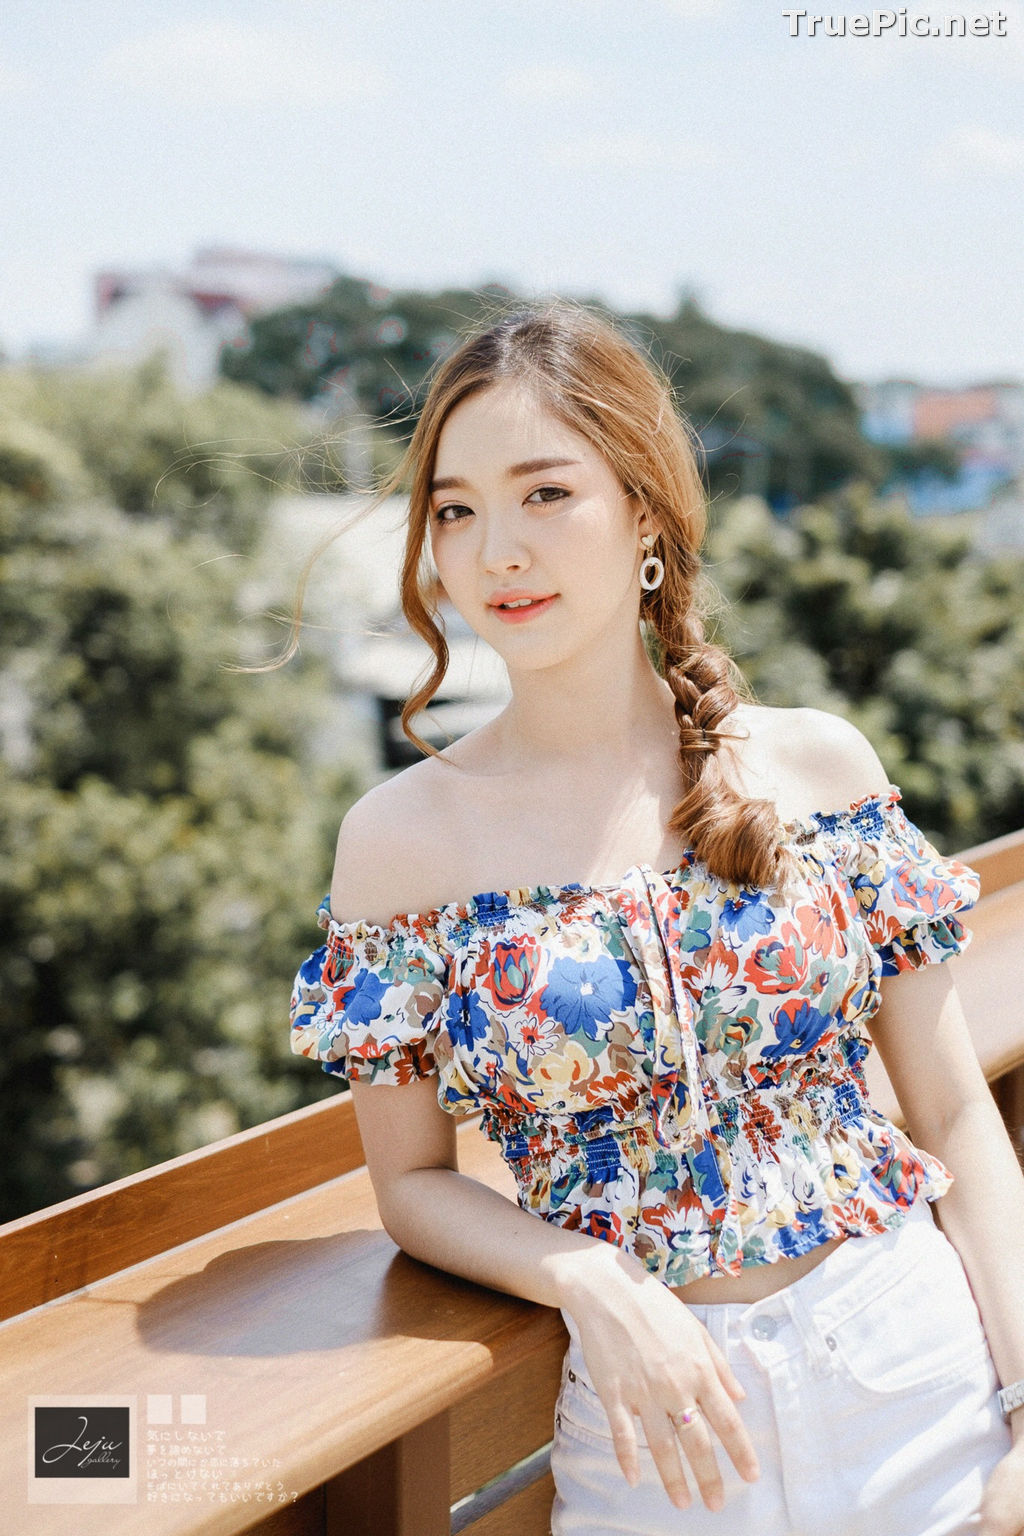 Image Thailand Beautiful Model - Viva Pongdechkajorn - Tetta Viva - TruePic.net - Picture-5